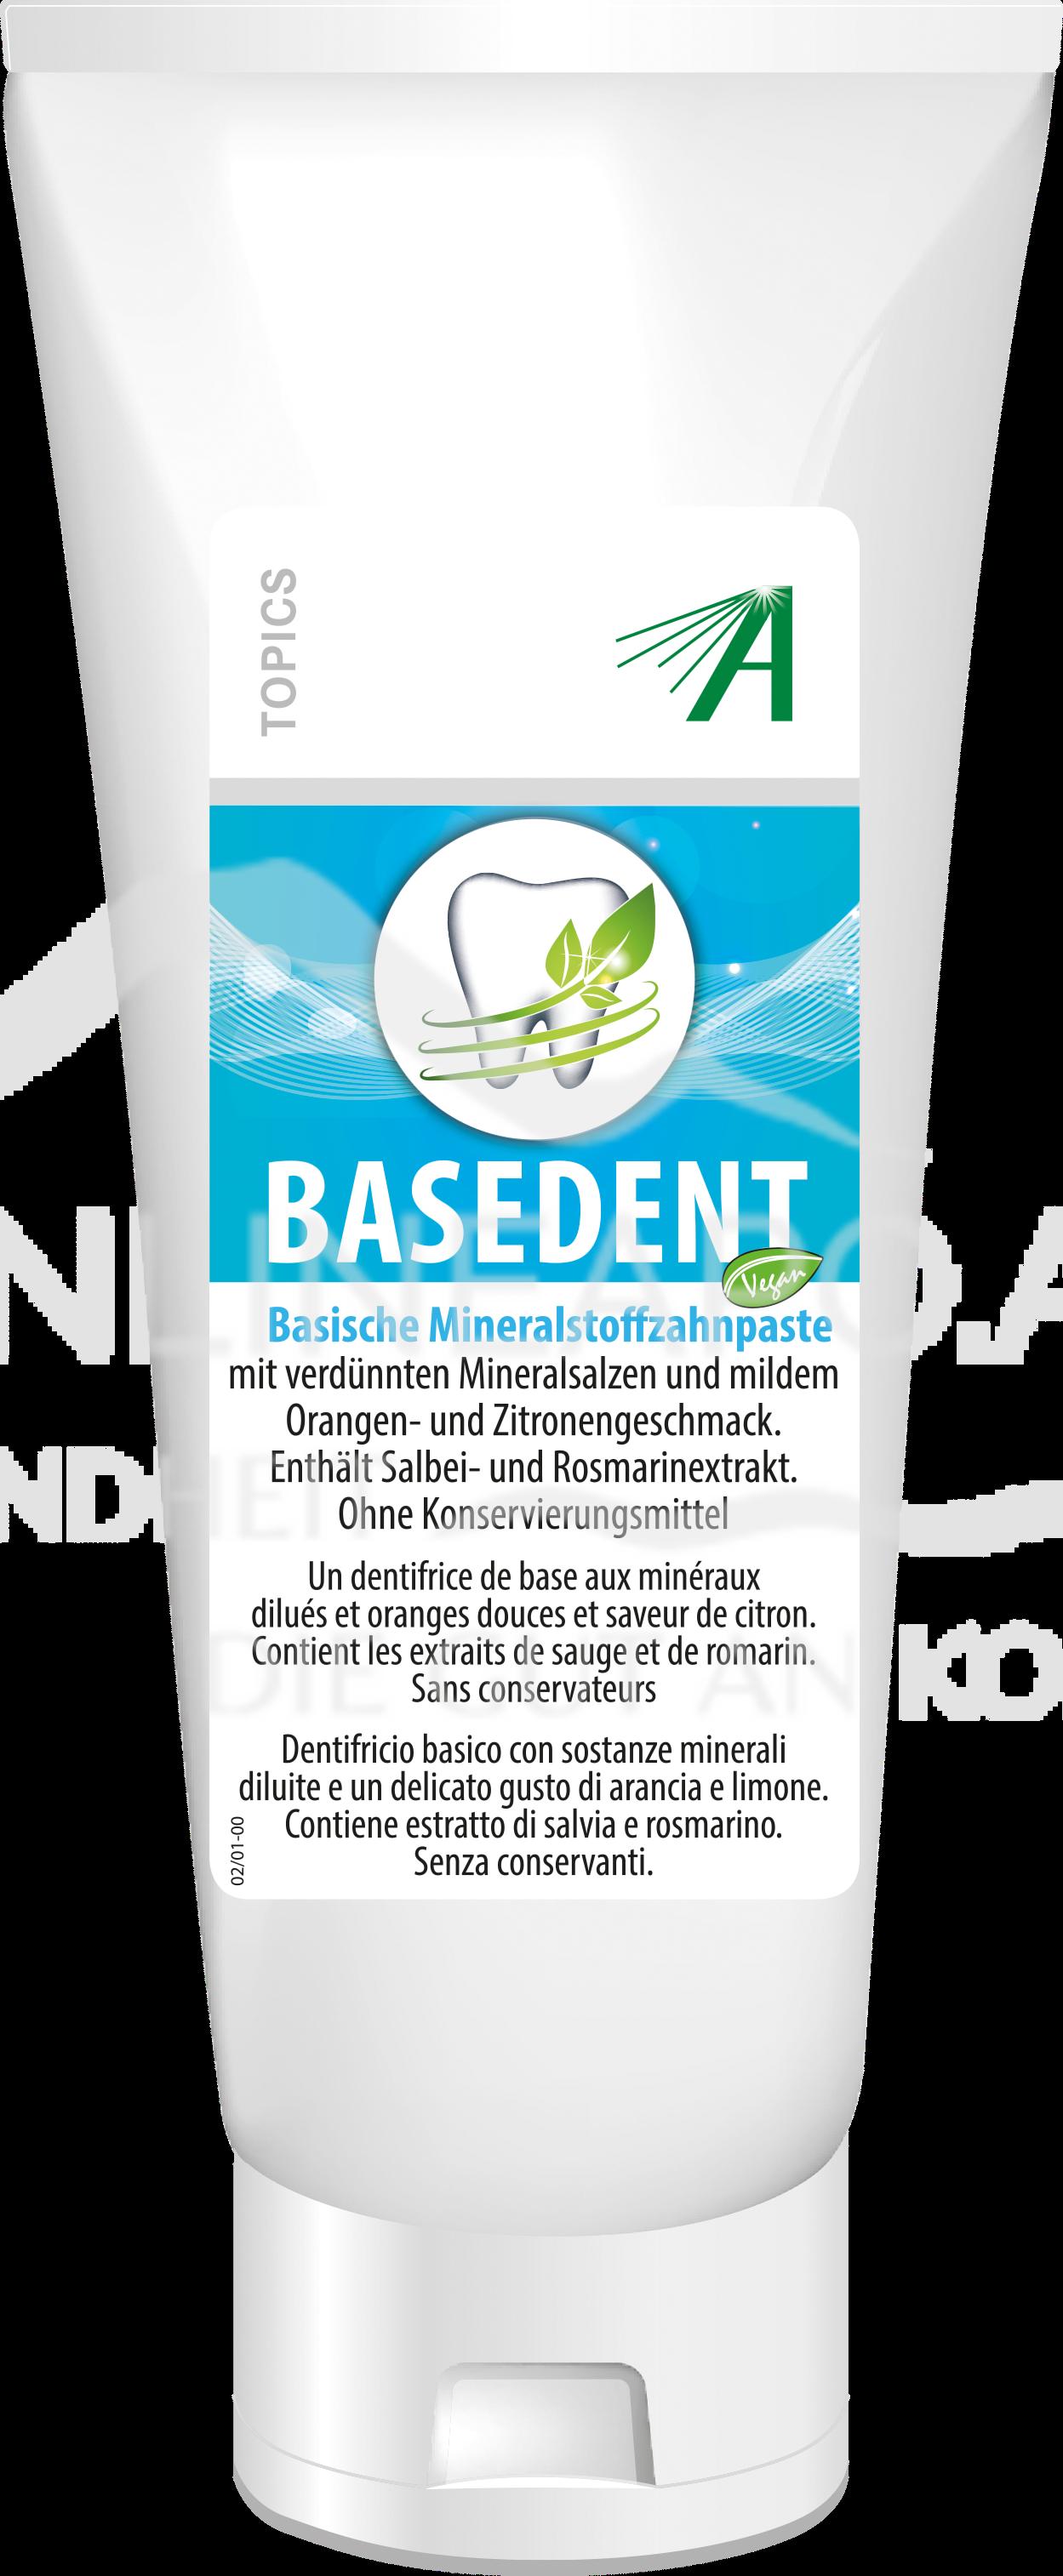 Adler BaseDent